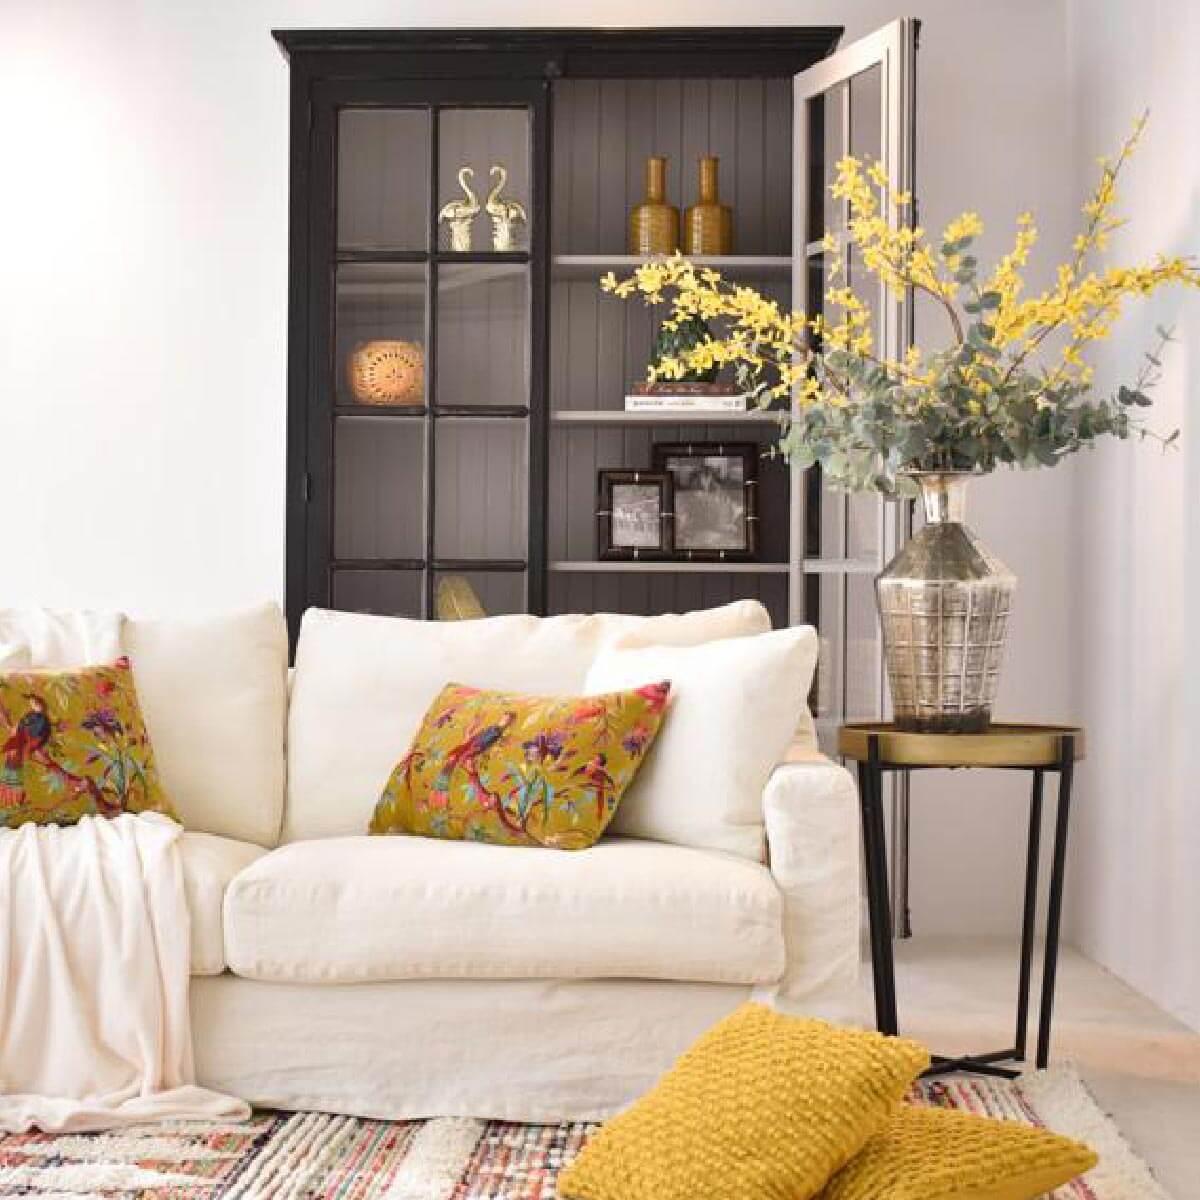 Audrey-2-Door-Showcase-with-Espagnolette-Lock-Cozy-Home-Dubai-uae